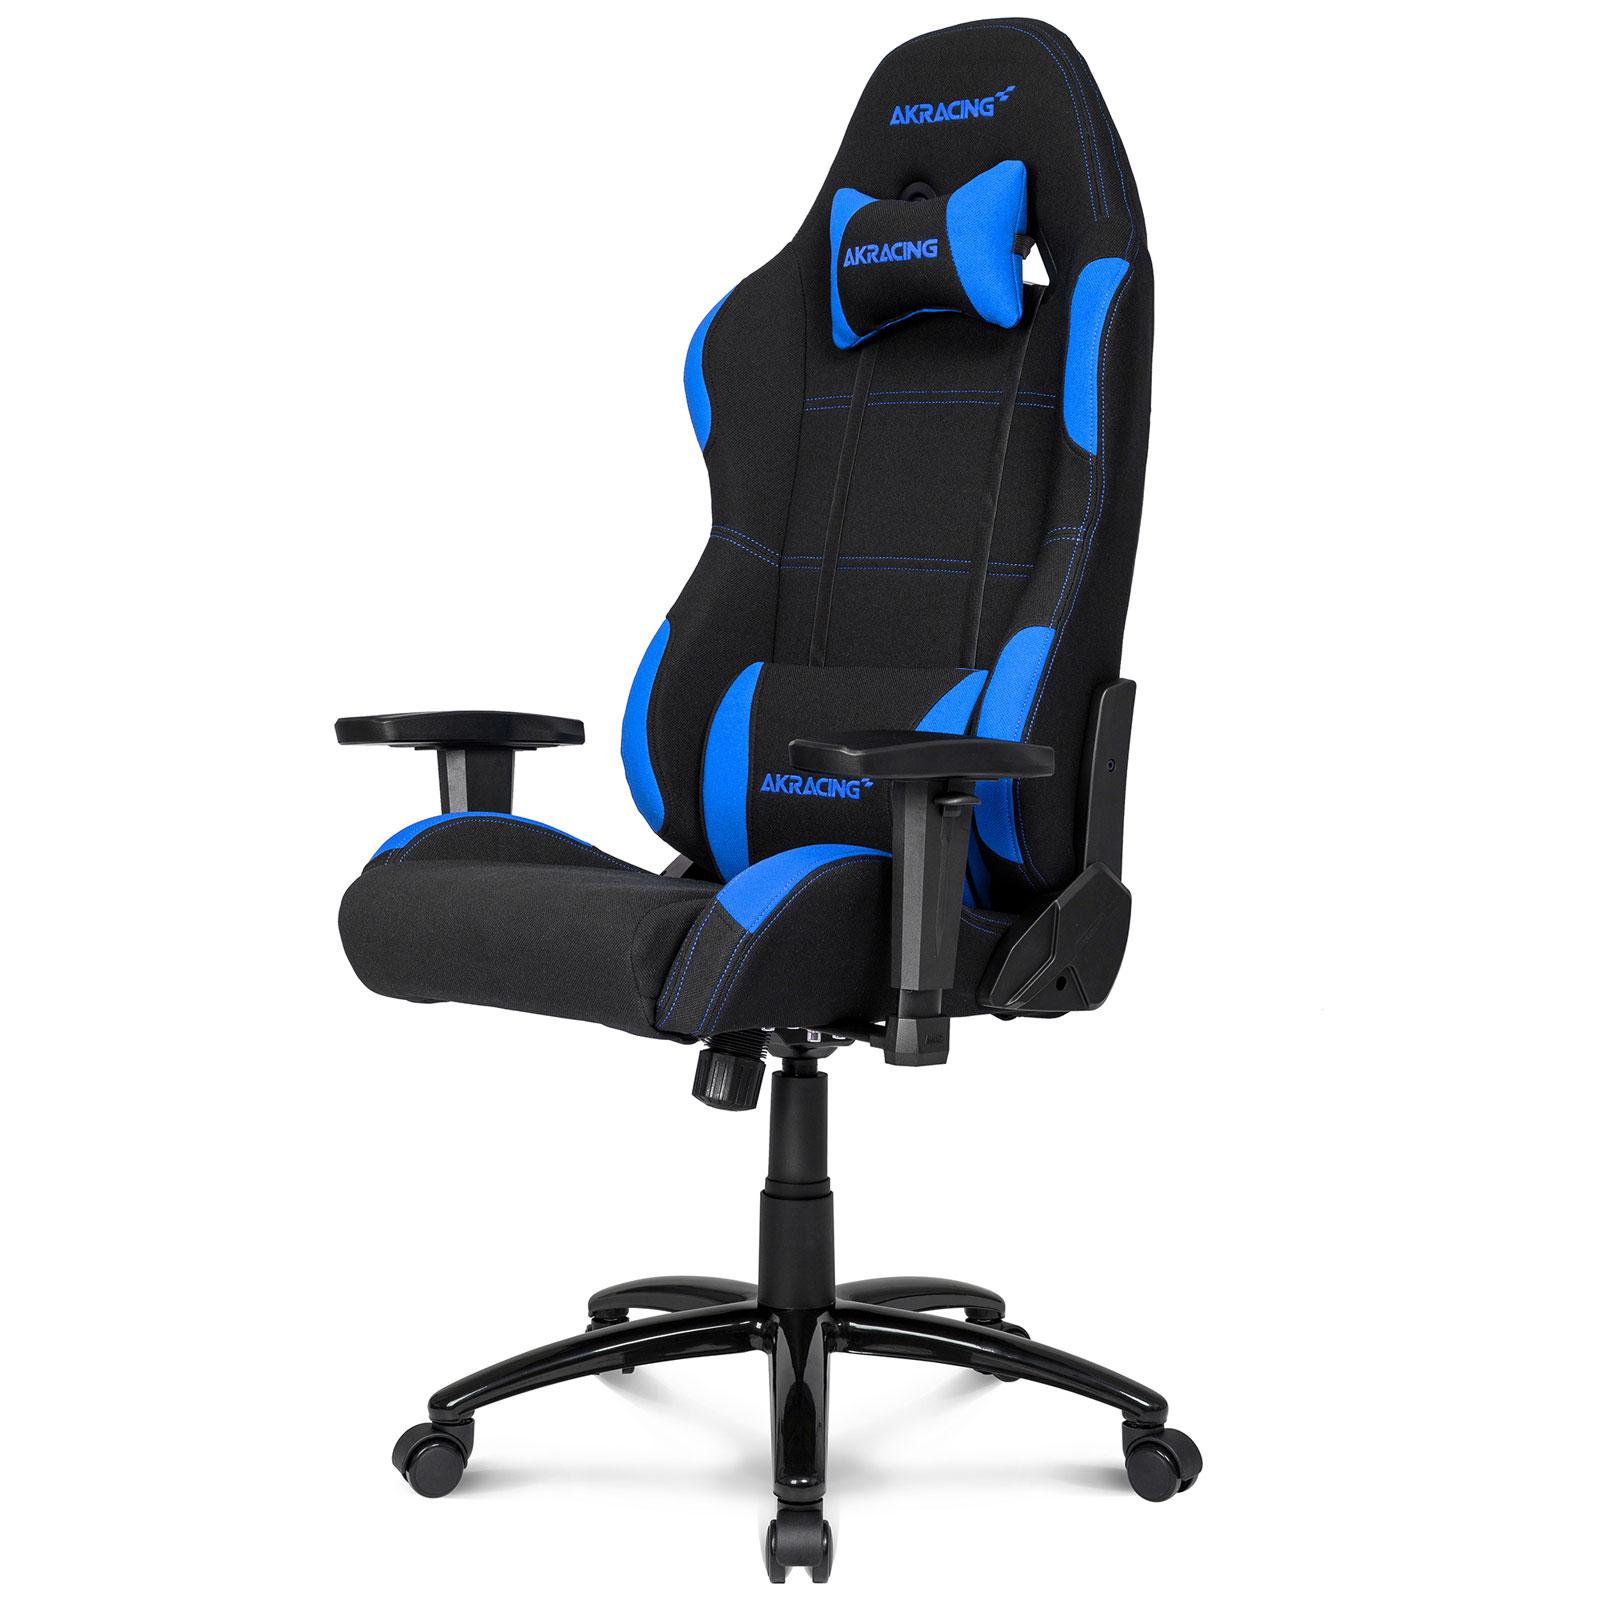 akracing gaming chair bleu fauteuil gamer akracing sur. Black Bedroom Furniture Sets. Home Design Ideas